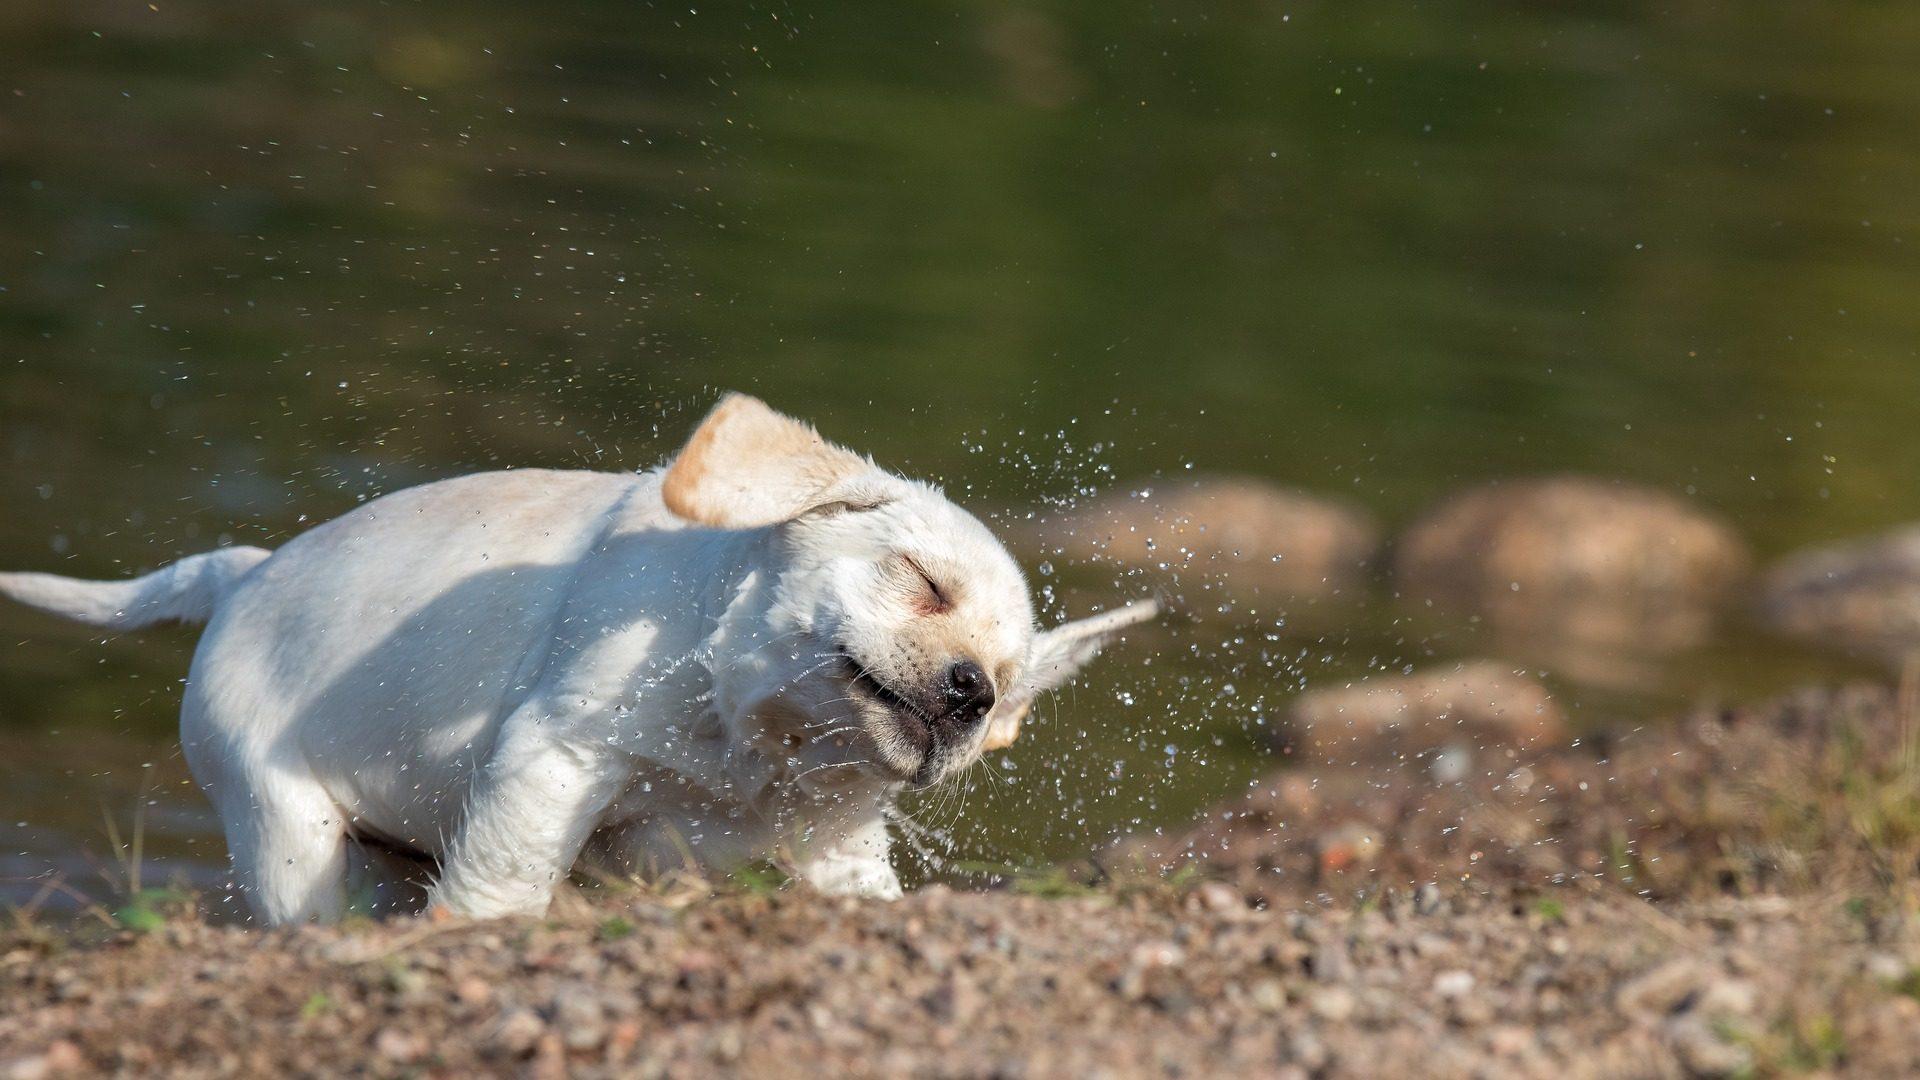 perro, cachorro, mascota, agua, mojado - Fondos de Pantalla HD - professor-falken.com